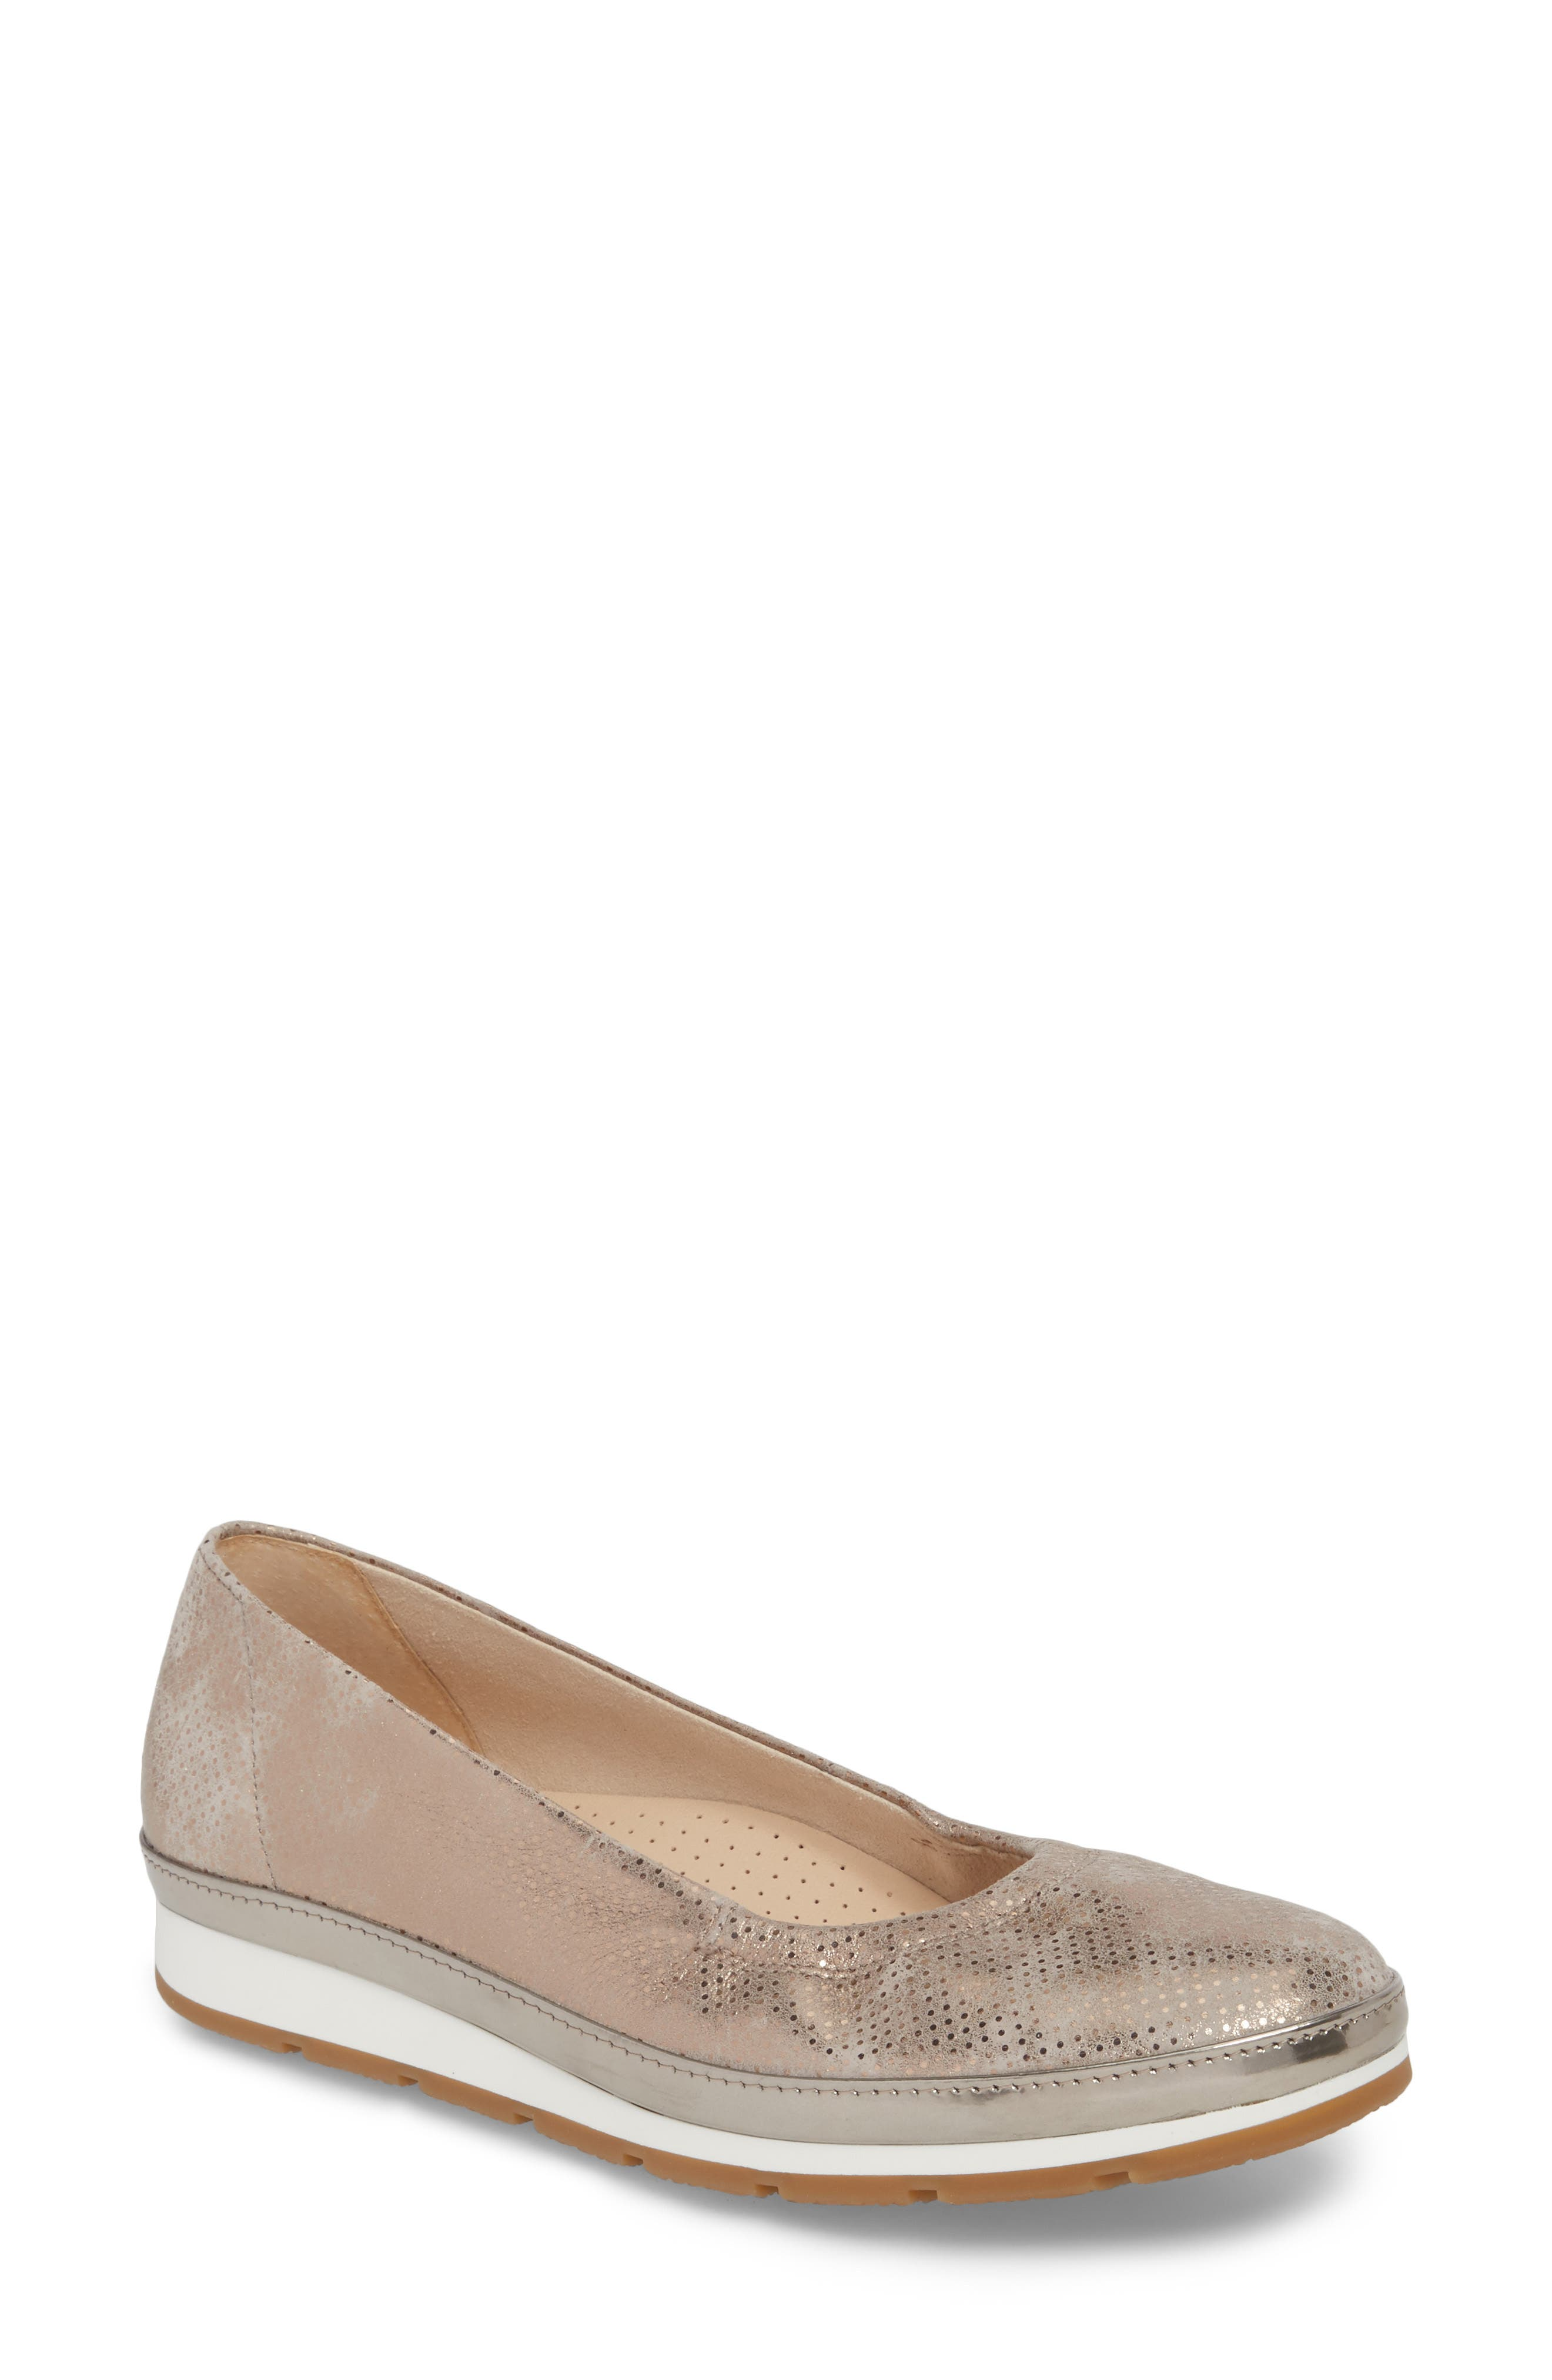 Ballet Wedge,                             Main thumbnail 1, color,                             Beige Metallic Leather